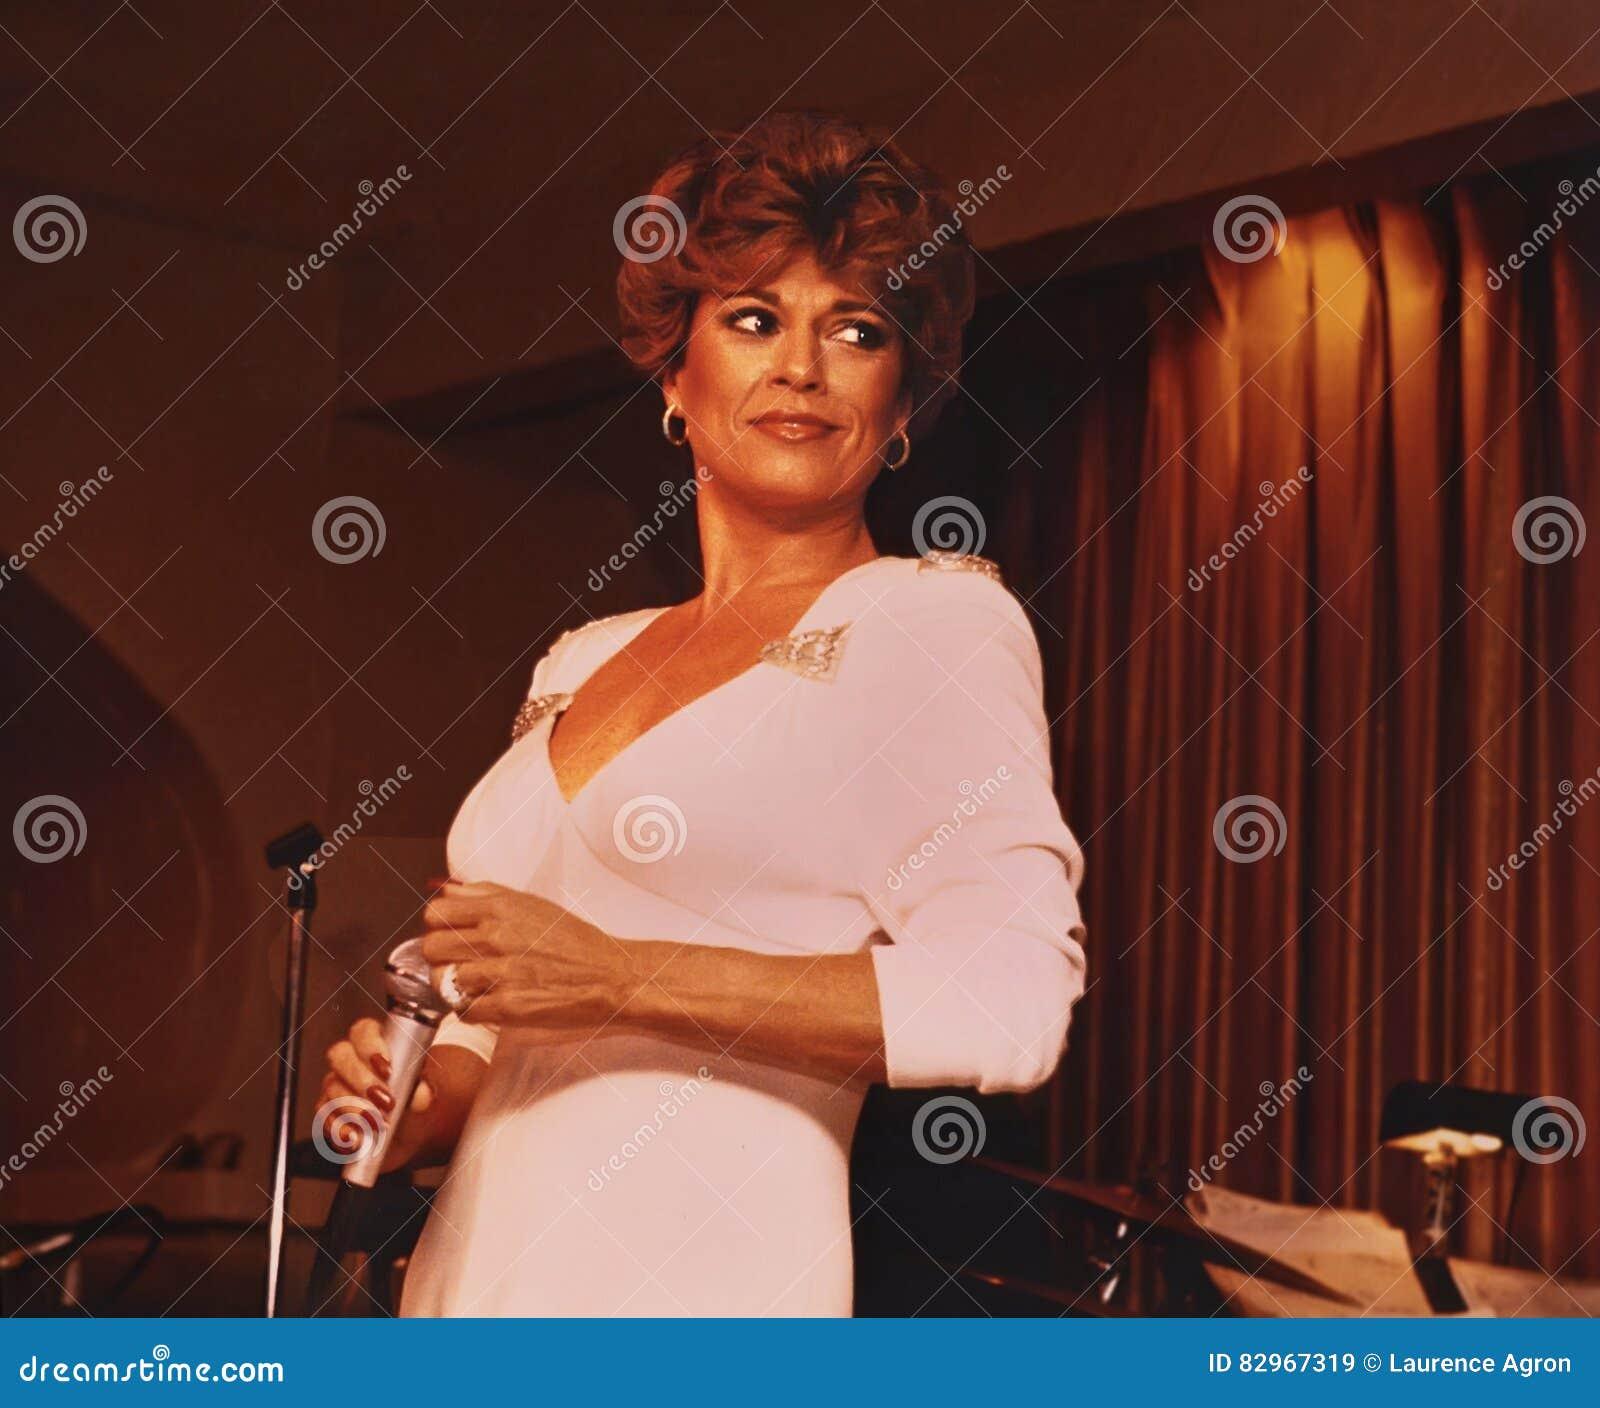 Symona Boniface,Kat Stewart Sex pics Patina Miller,Anthony Hopkins (born 1937 (naturalized American citizen)